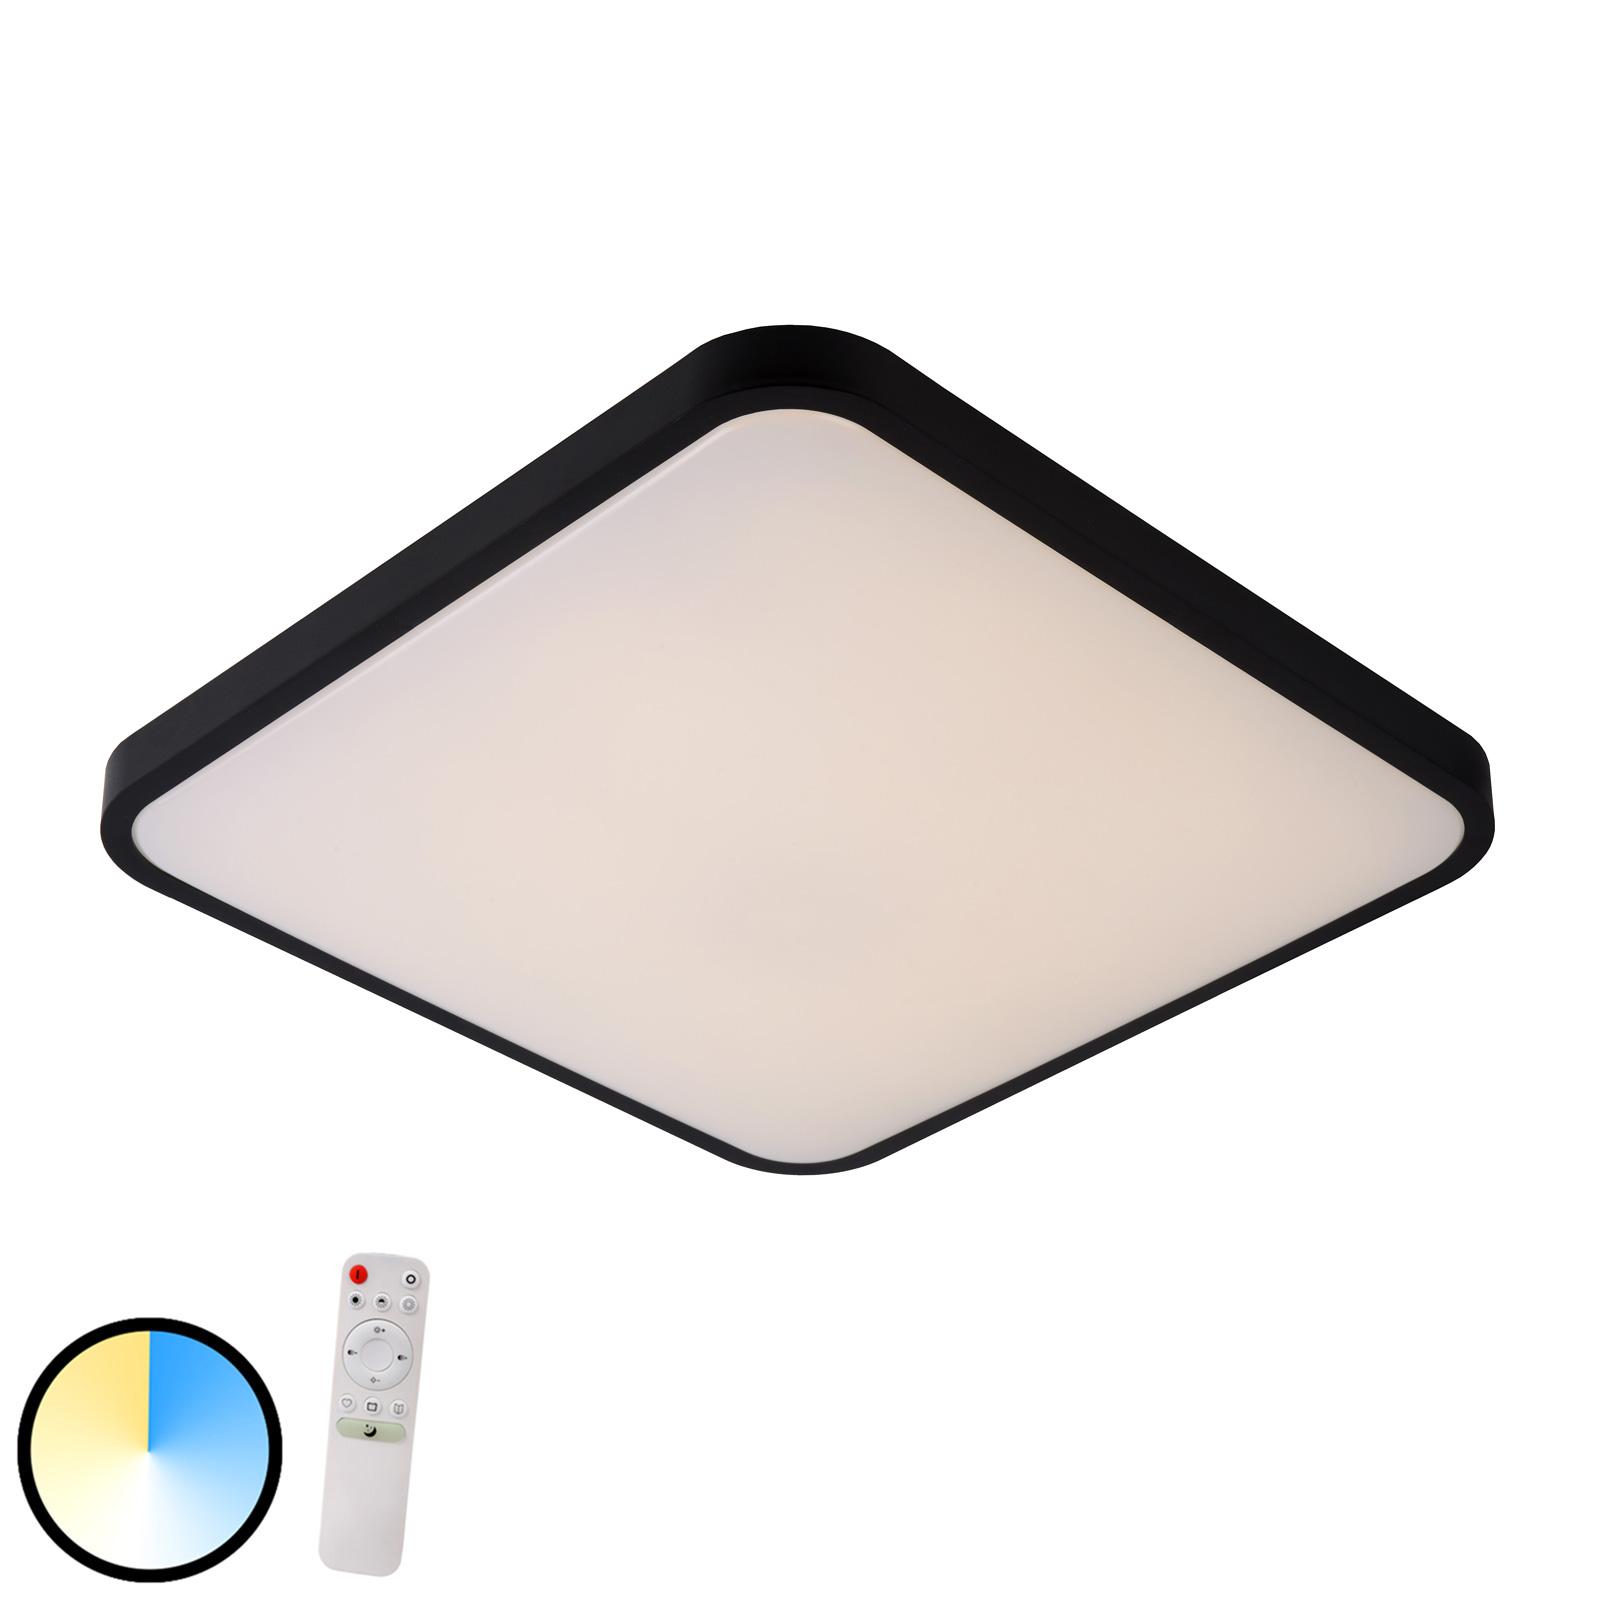 LED plafondlamp Polaris 43,4 cm x 43,4 cm